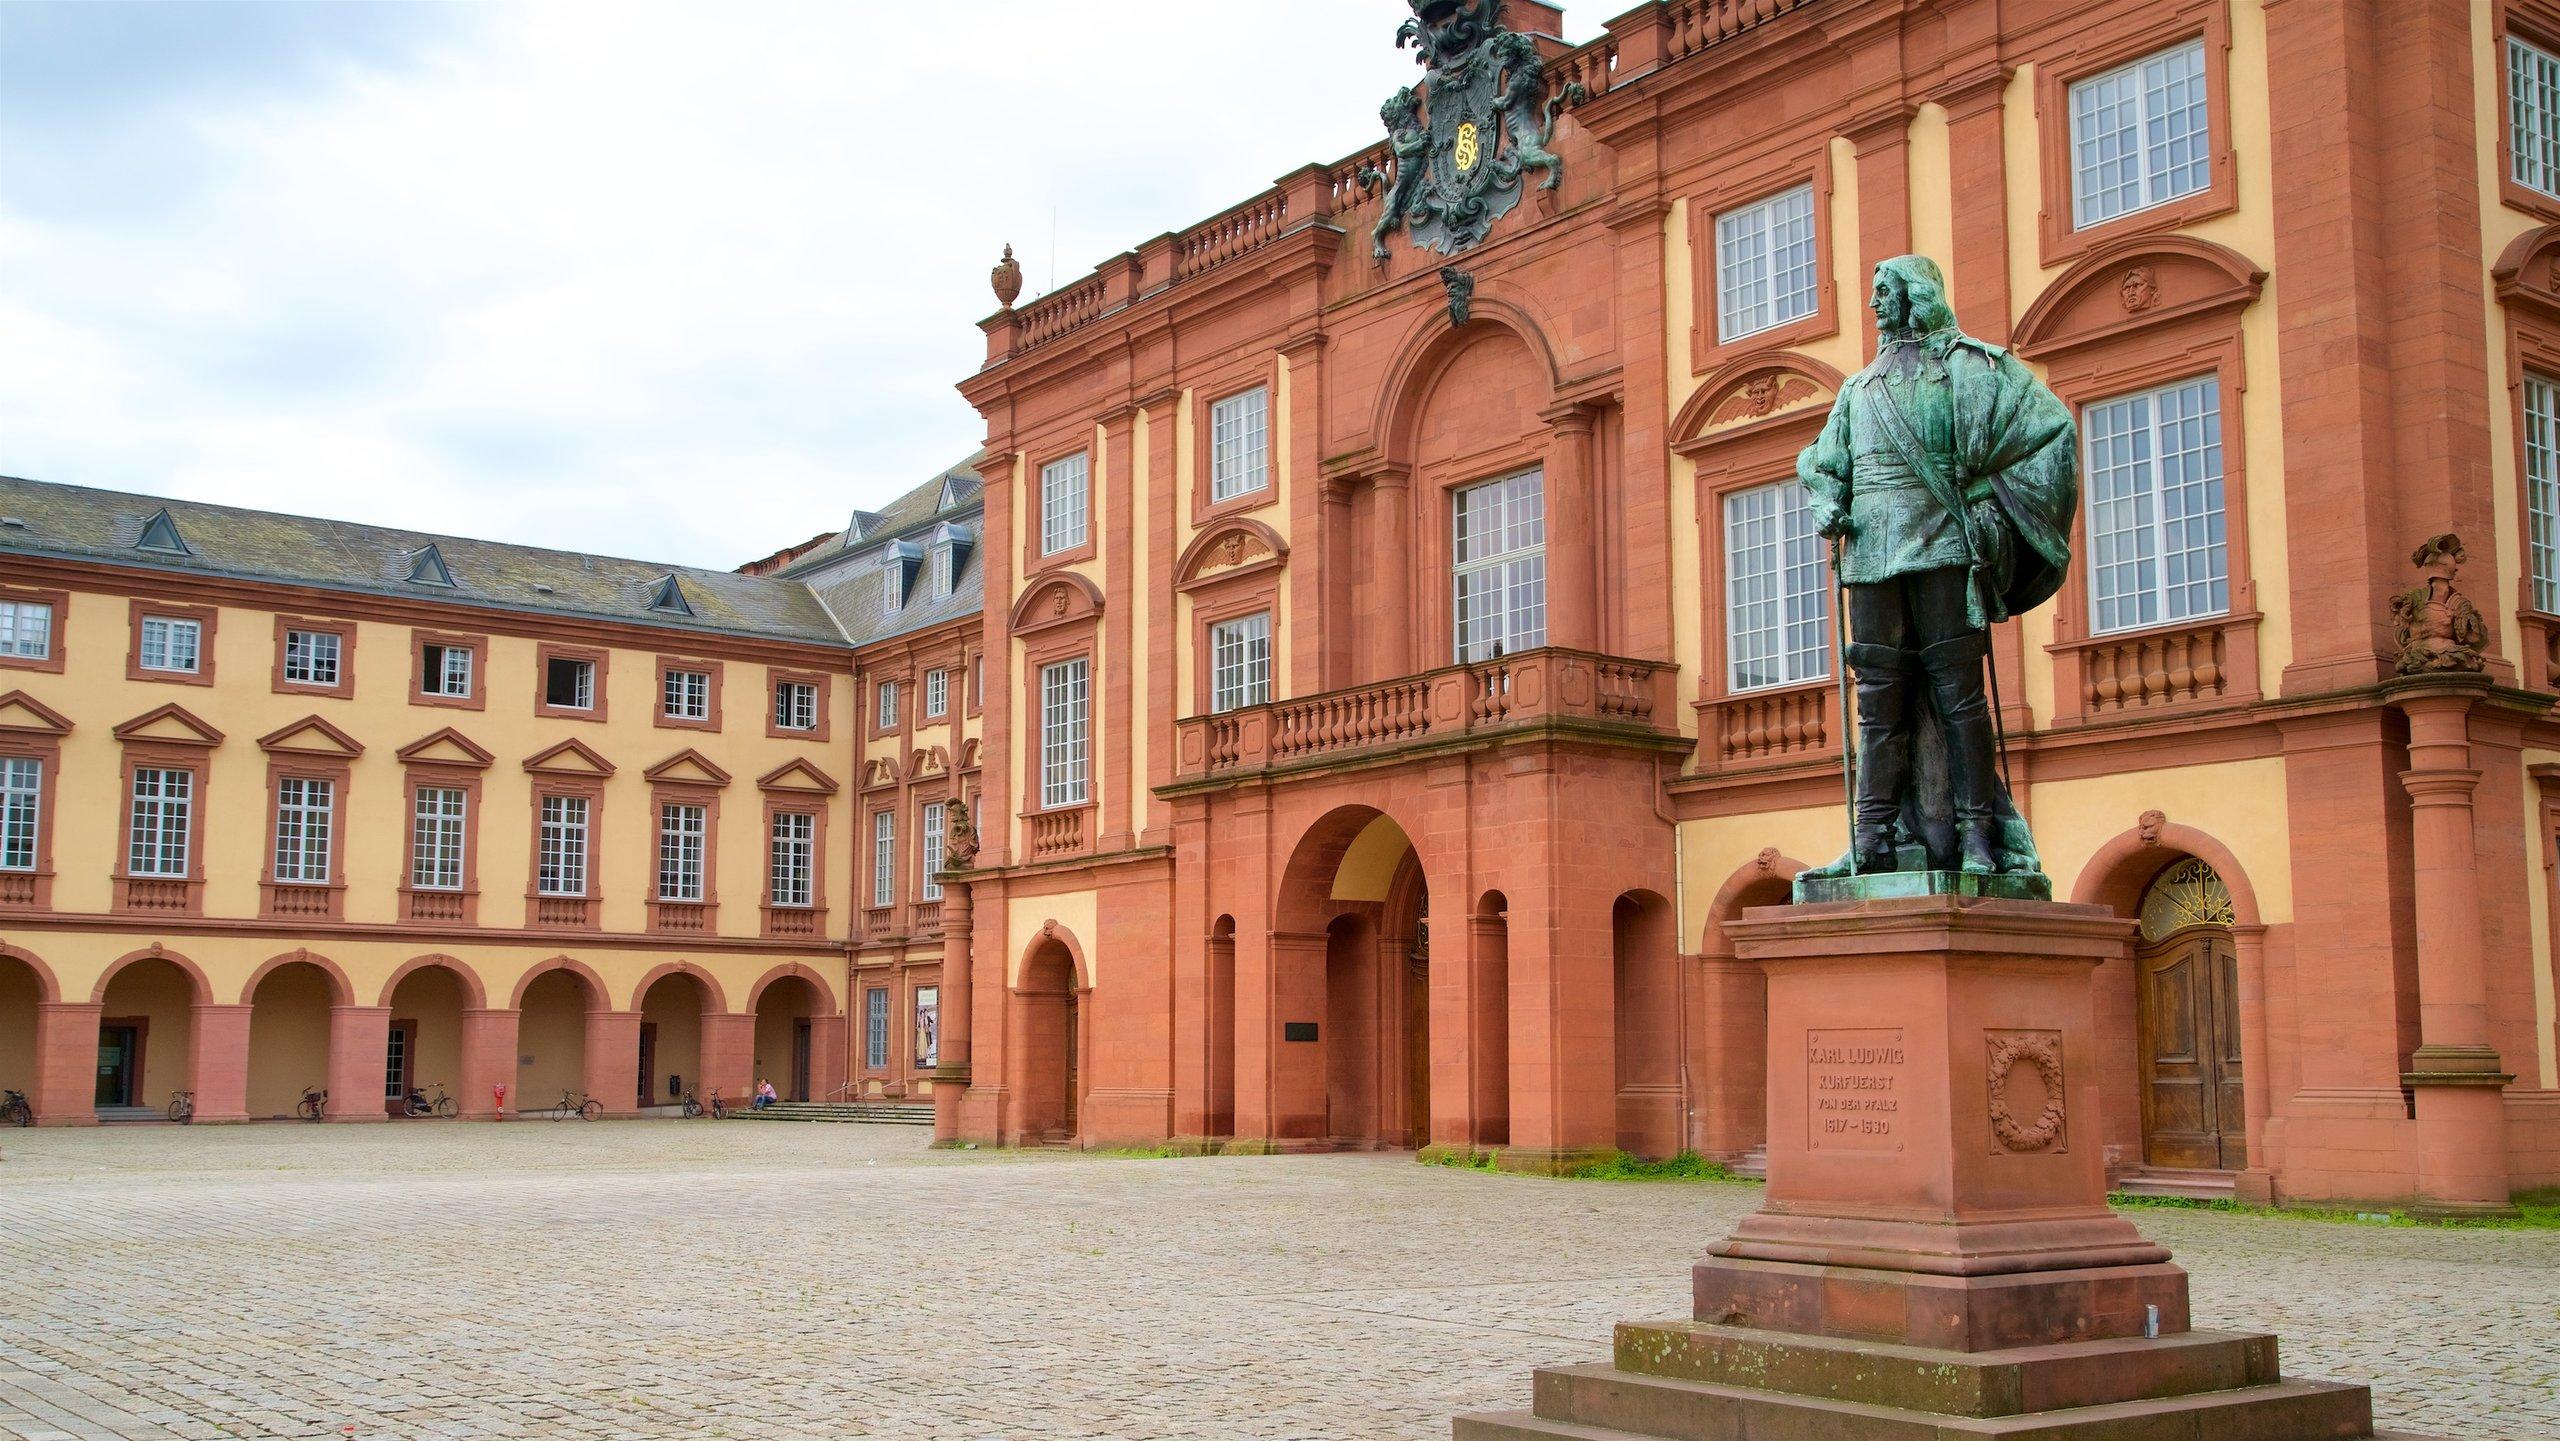 Mannheim Palace, Mannheim, Baden-Württemberg, Germany